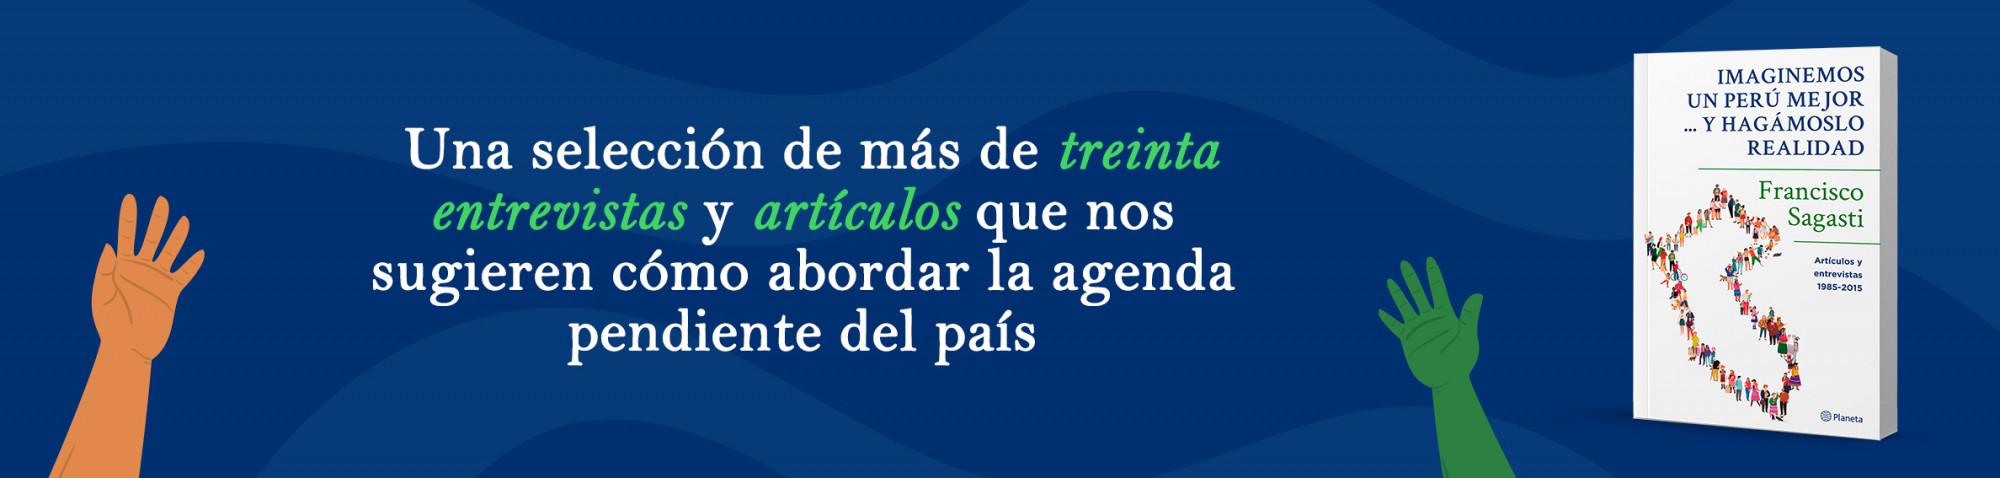 1246_1_IMAGINEMOS-UN-PERU-WEB.jpg